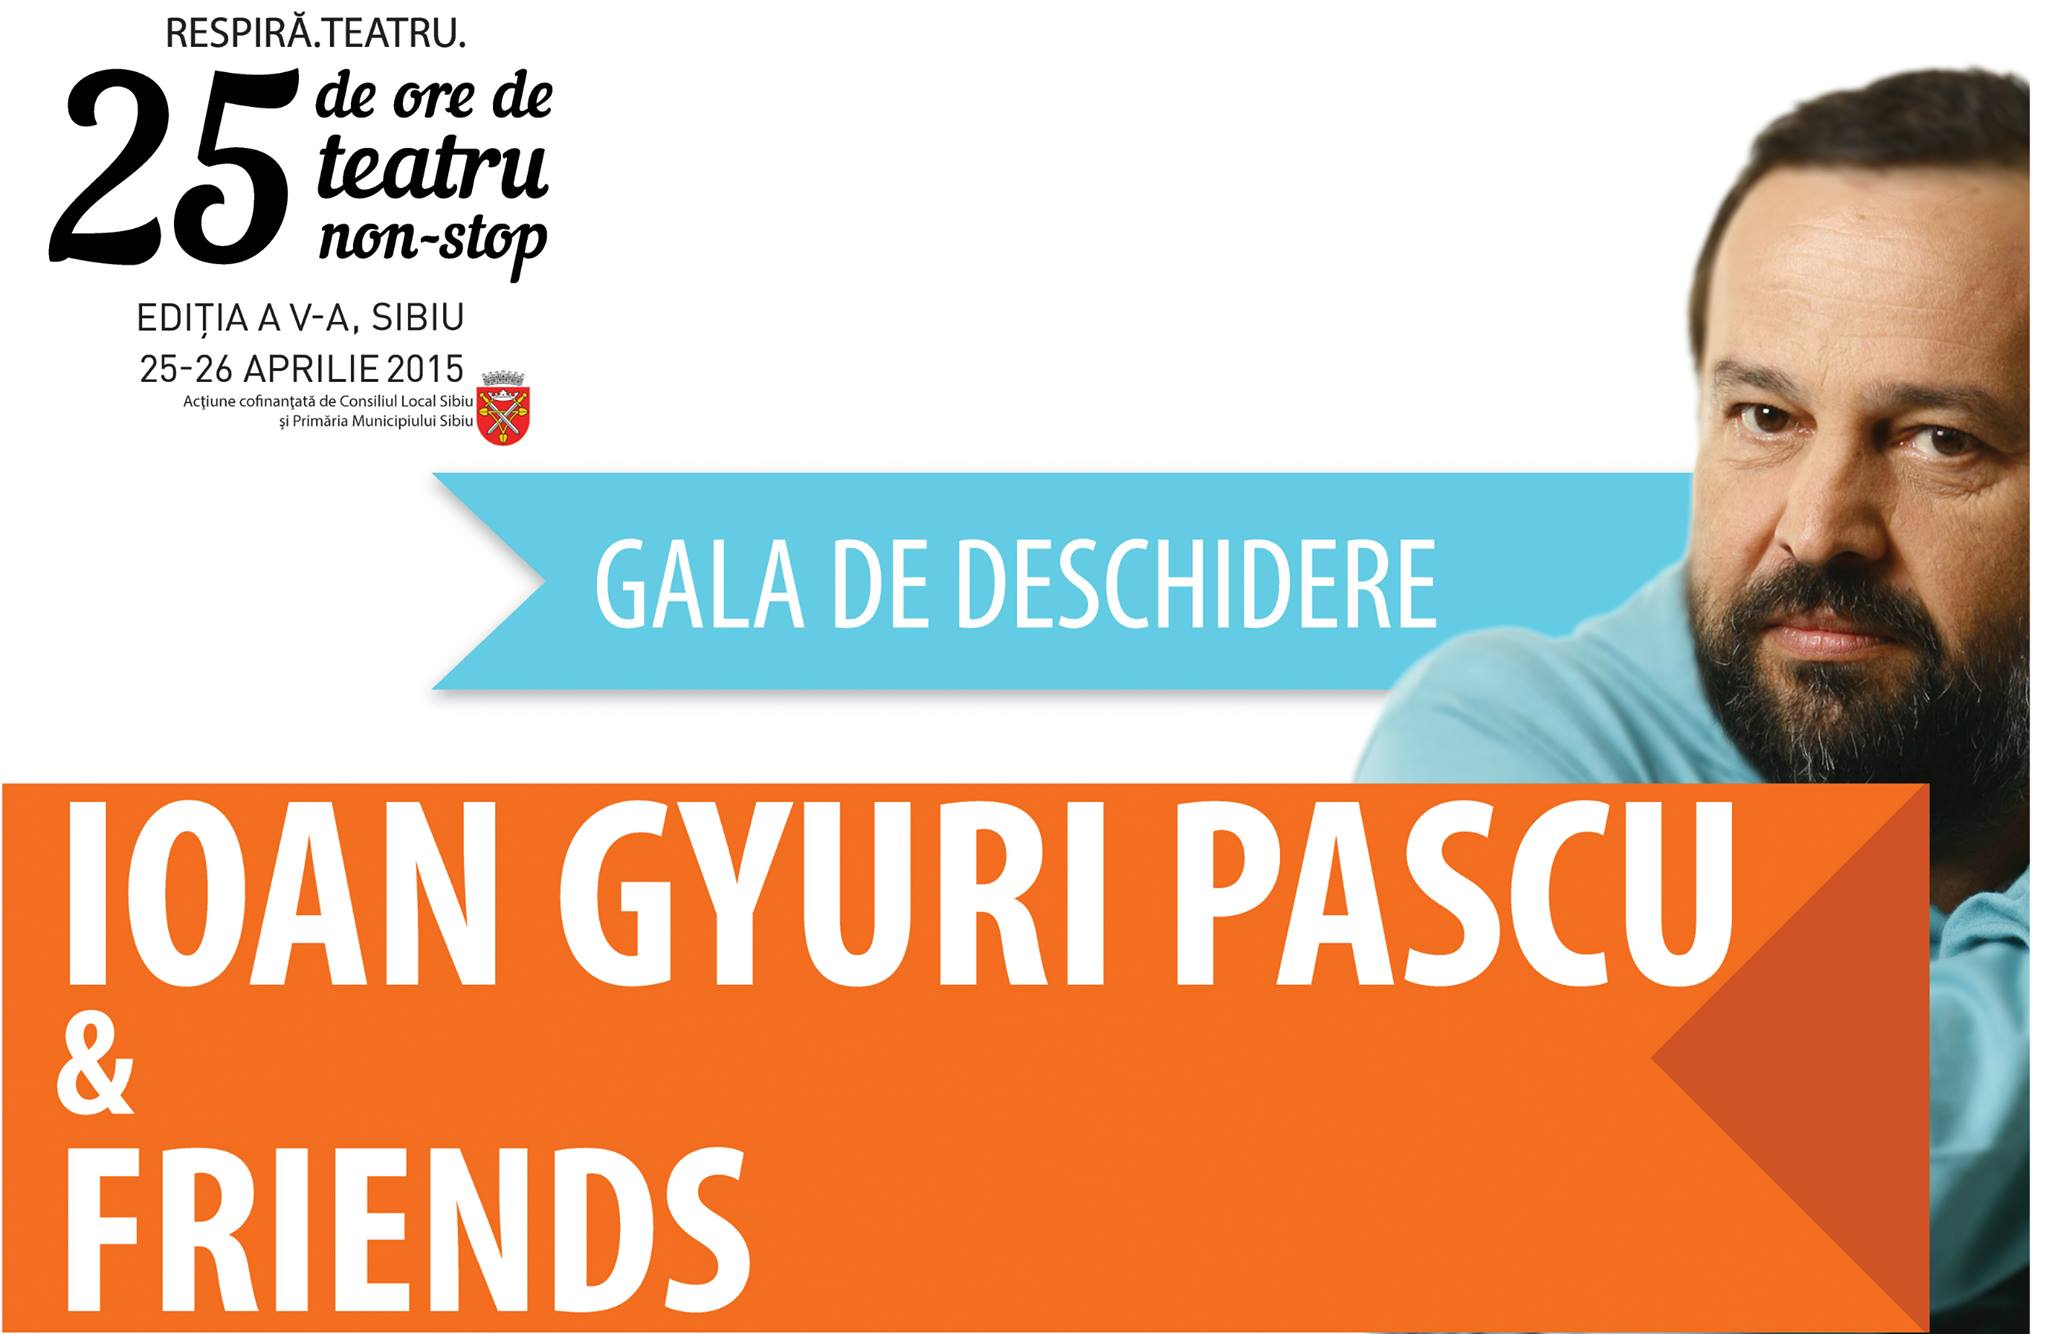 Ioan Gyuri Pascu & friends